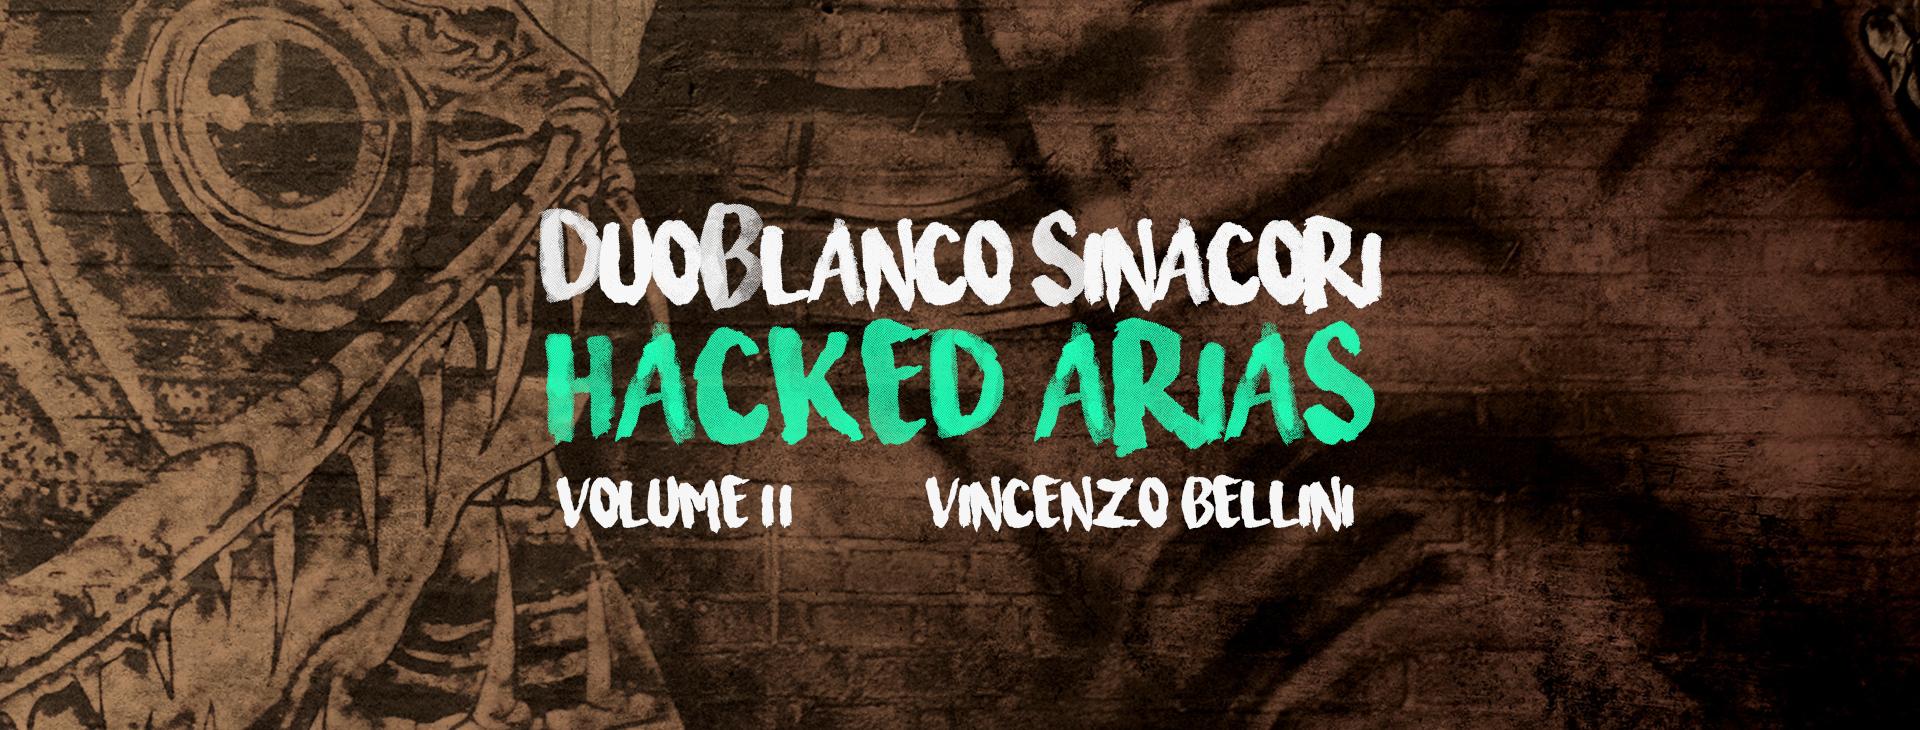 Hacked arias II